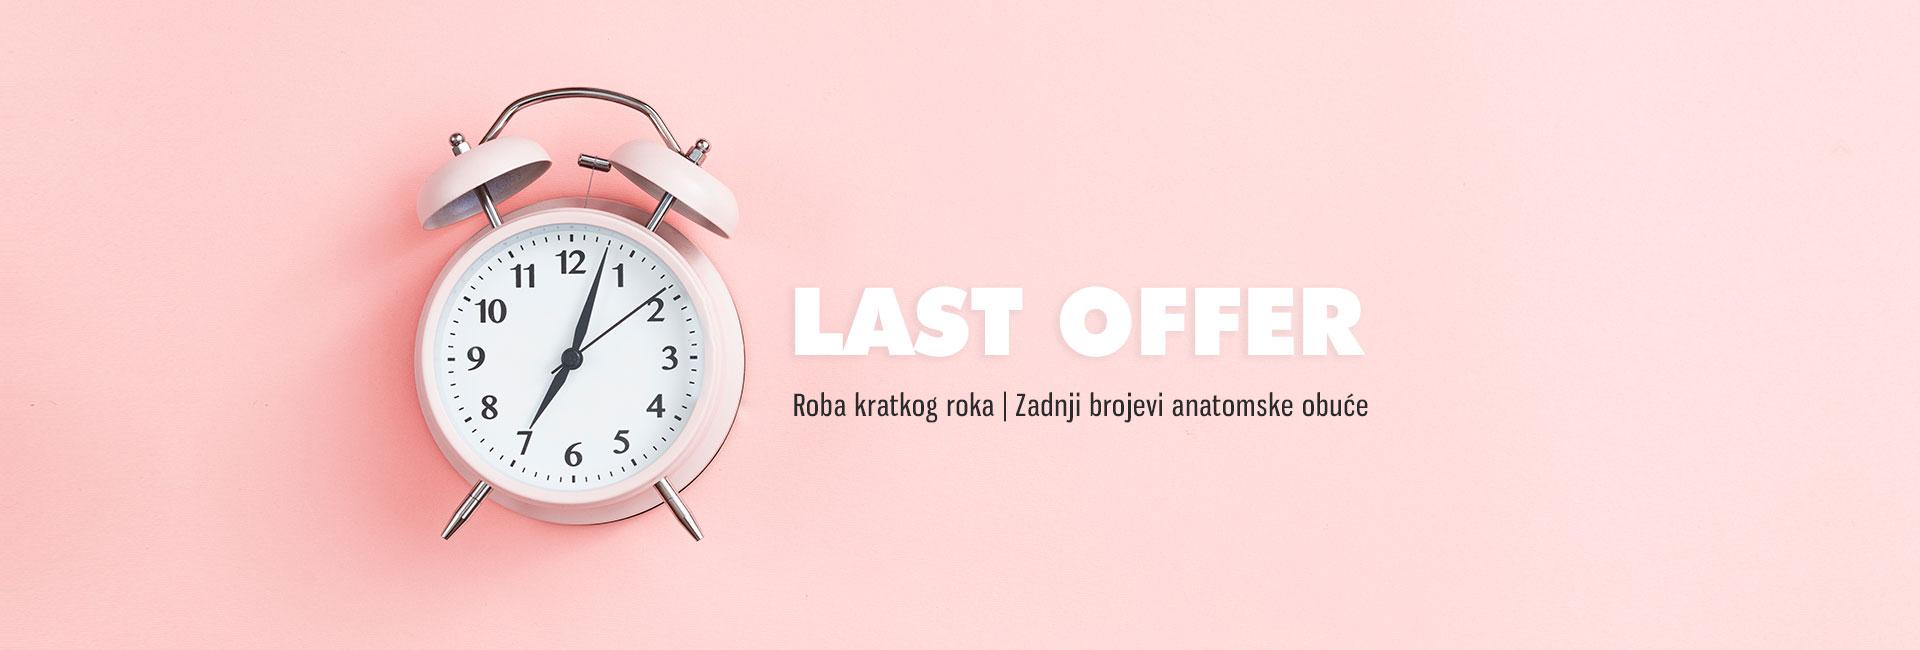 last offer